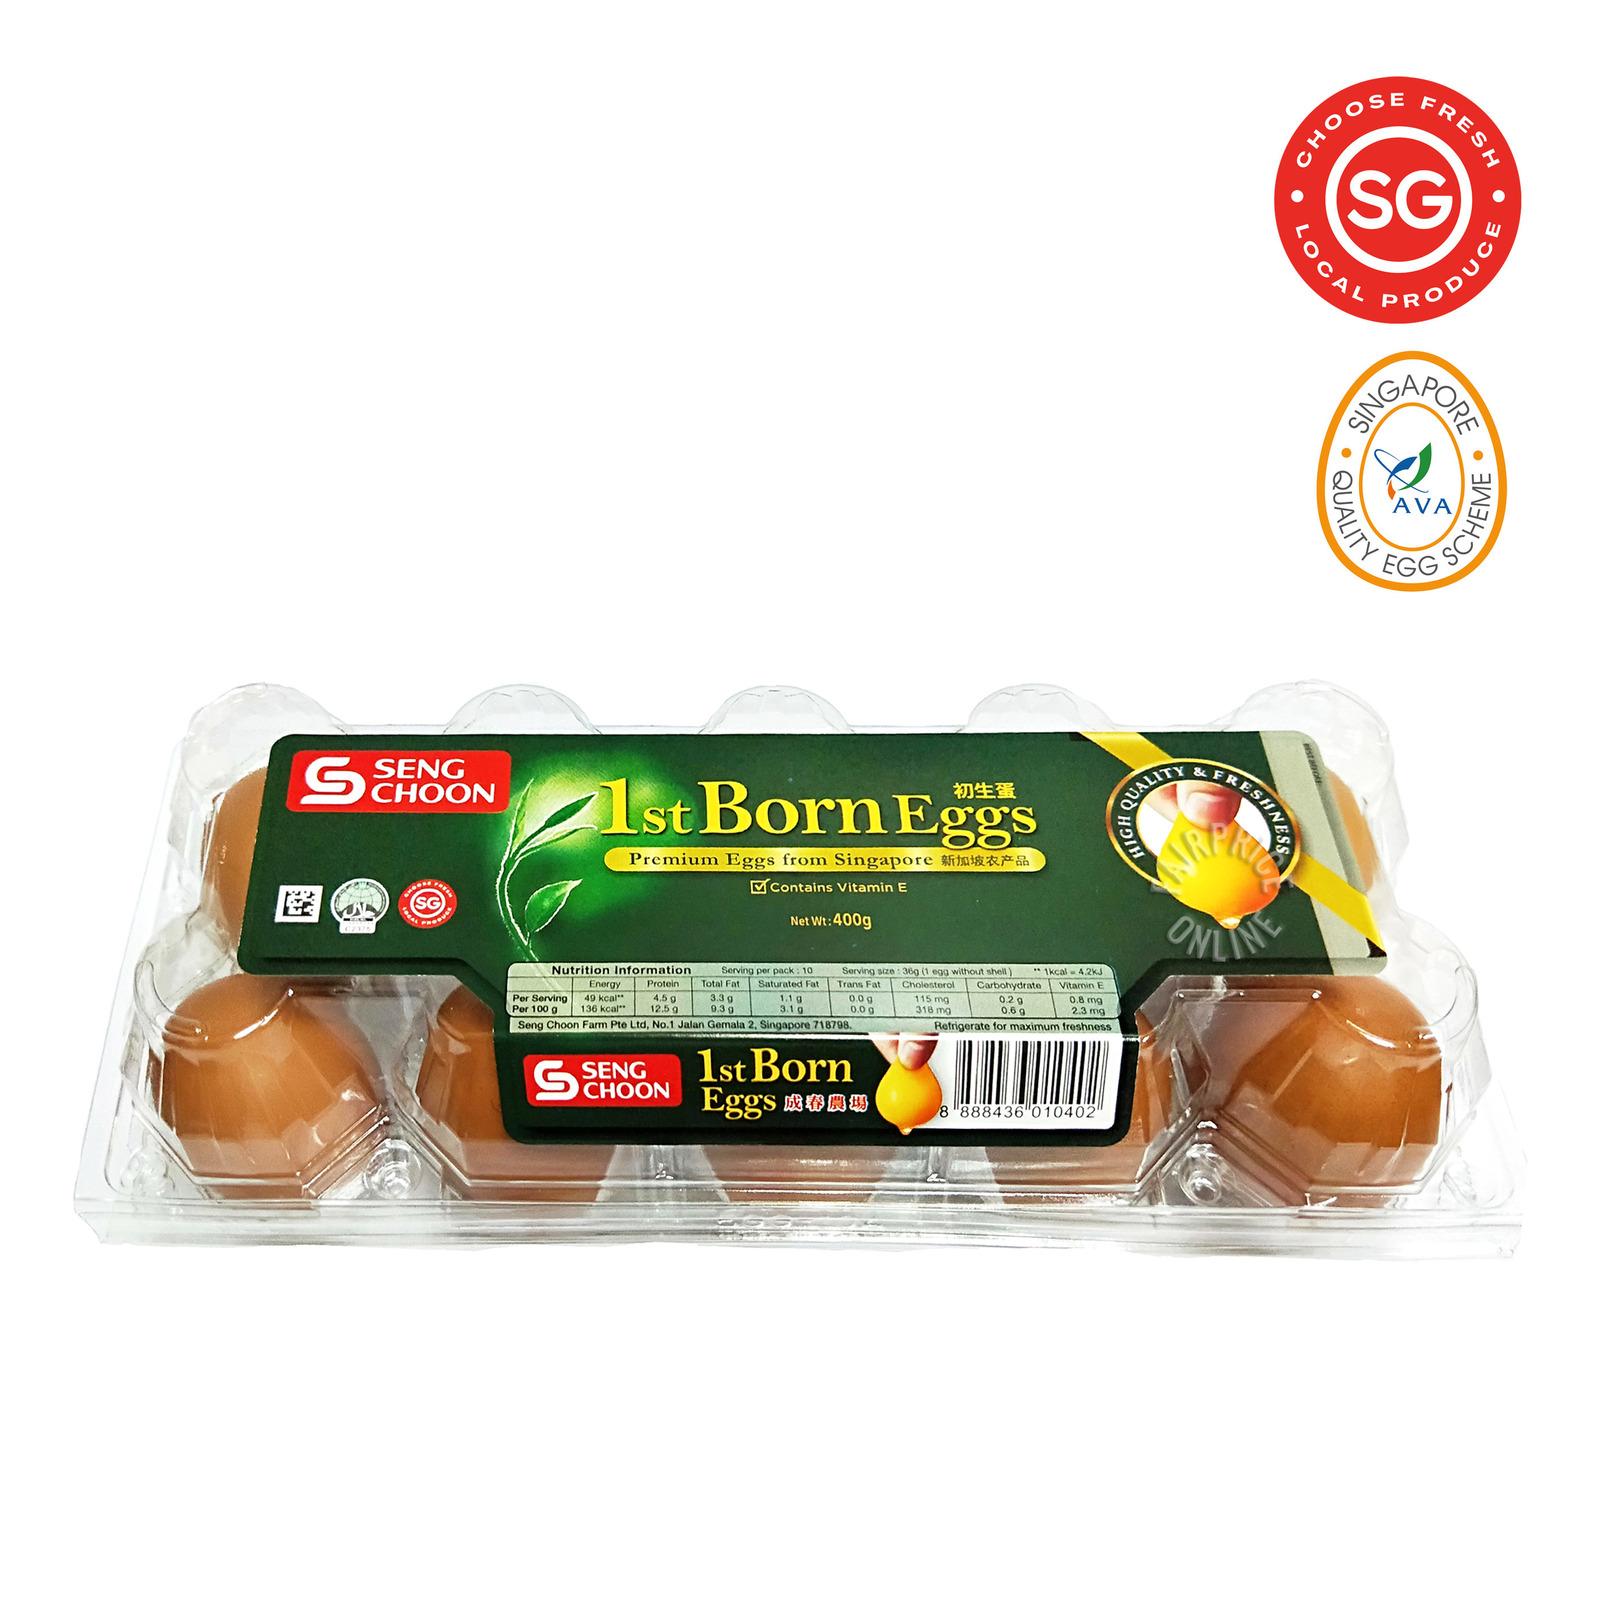 Seng Choon Lower Cholesterol Eggs - 1st Born